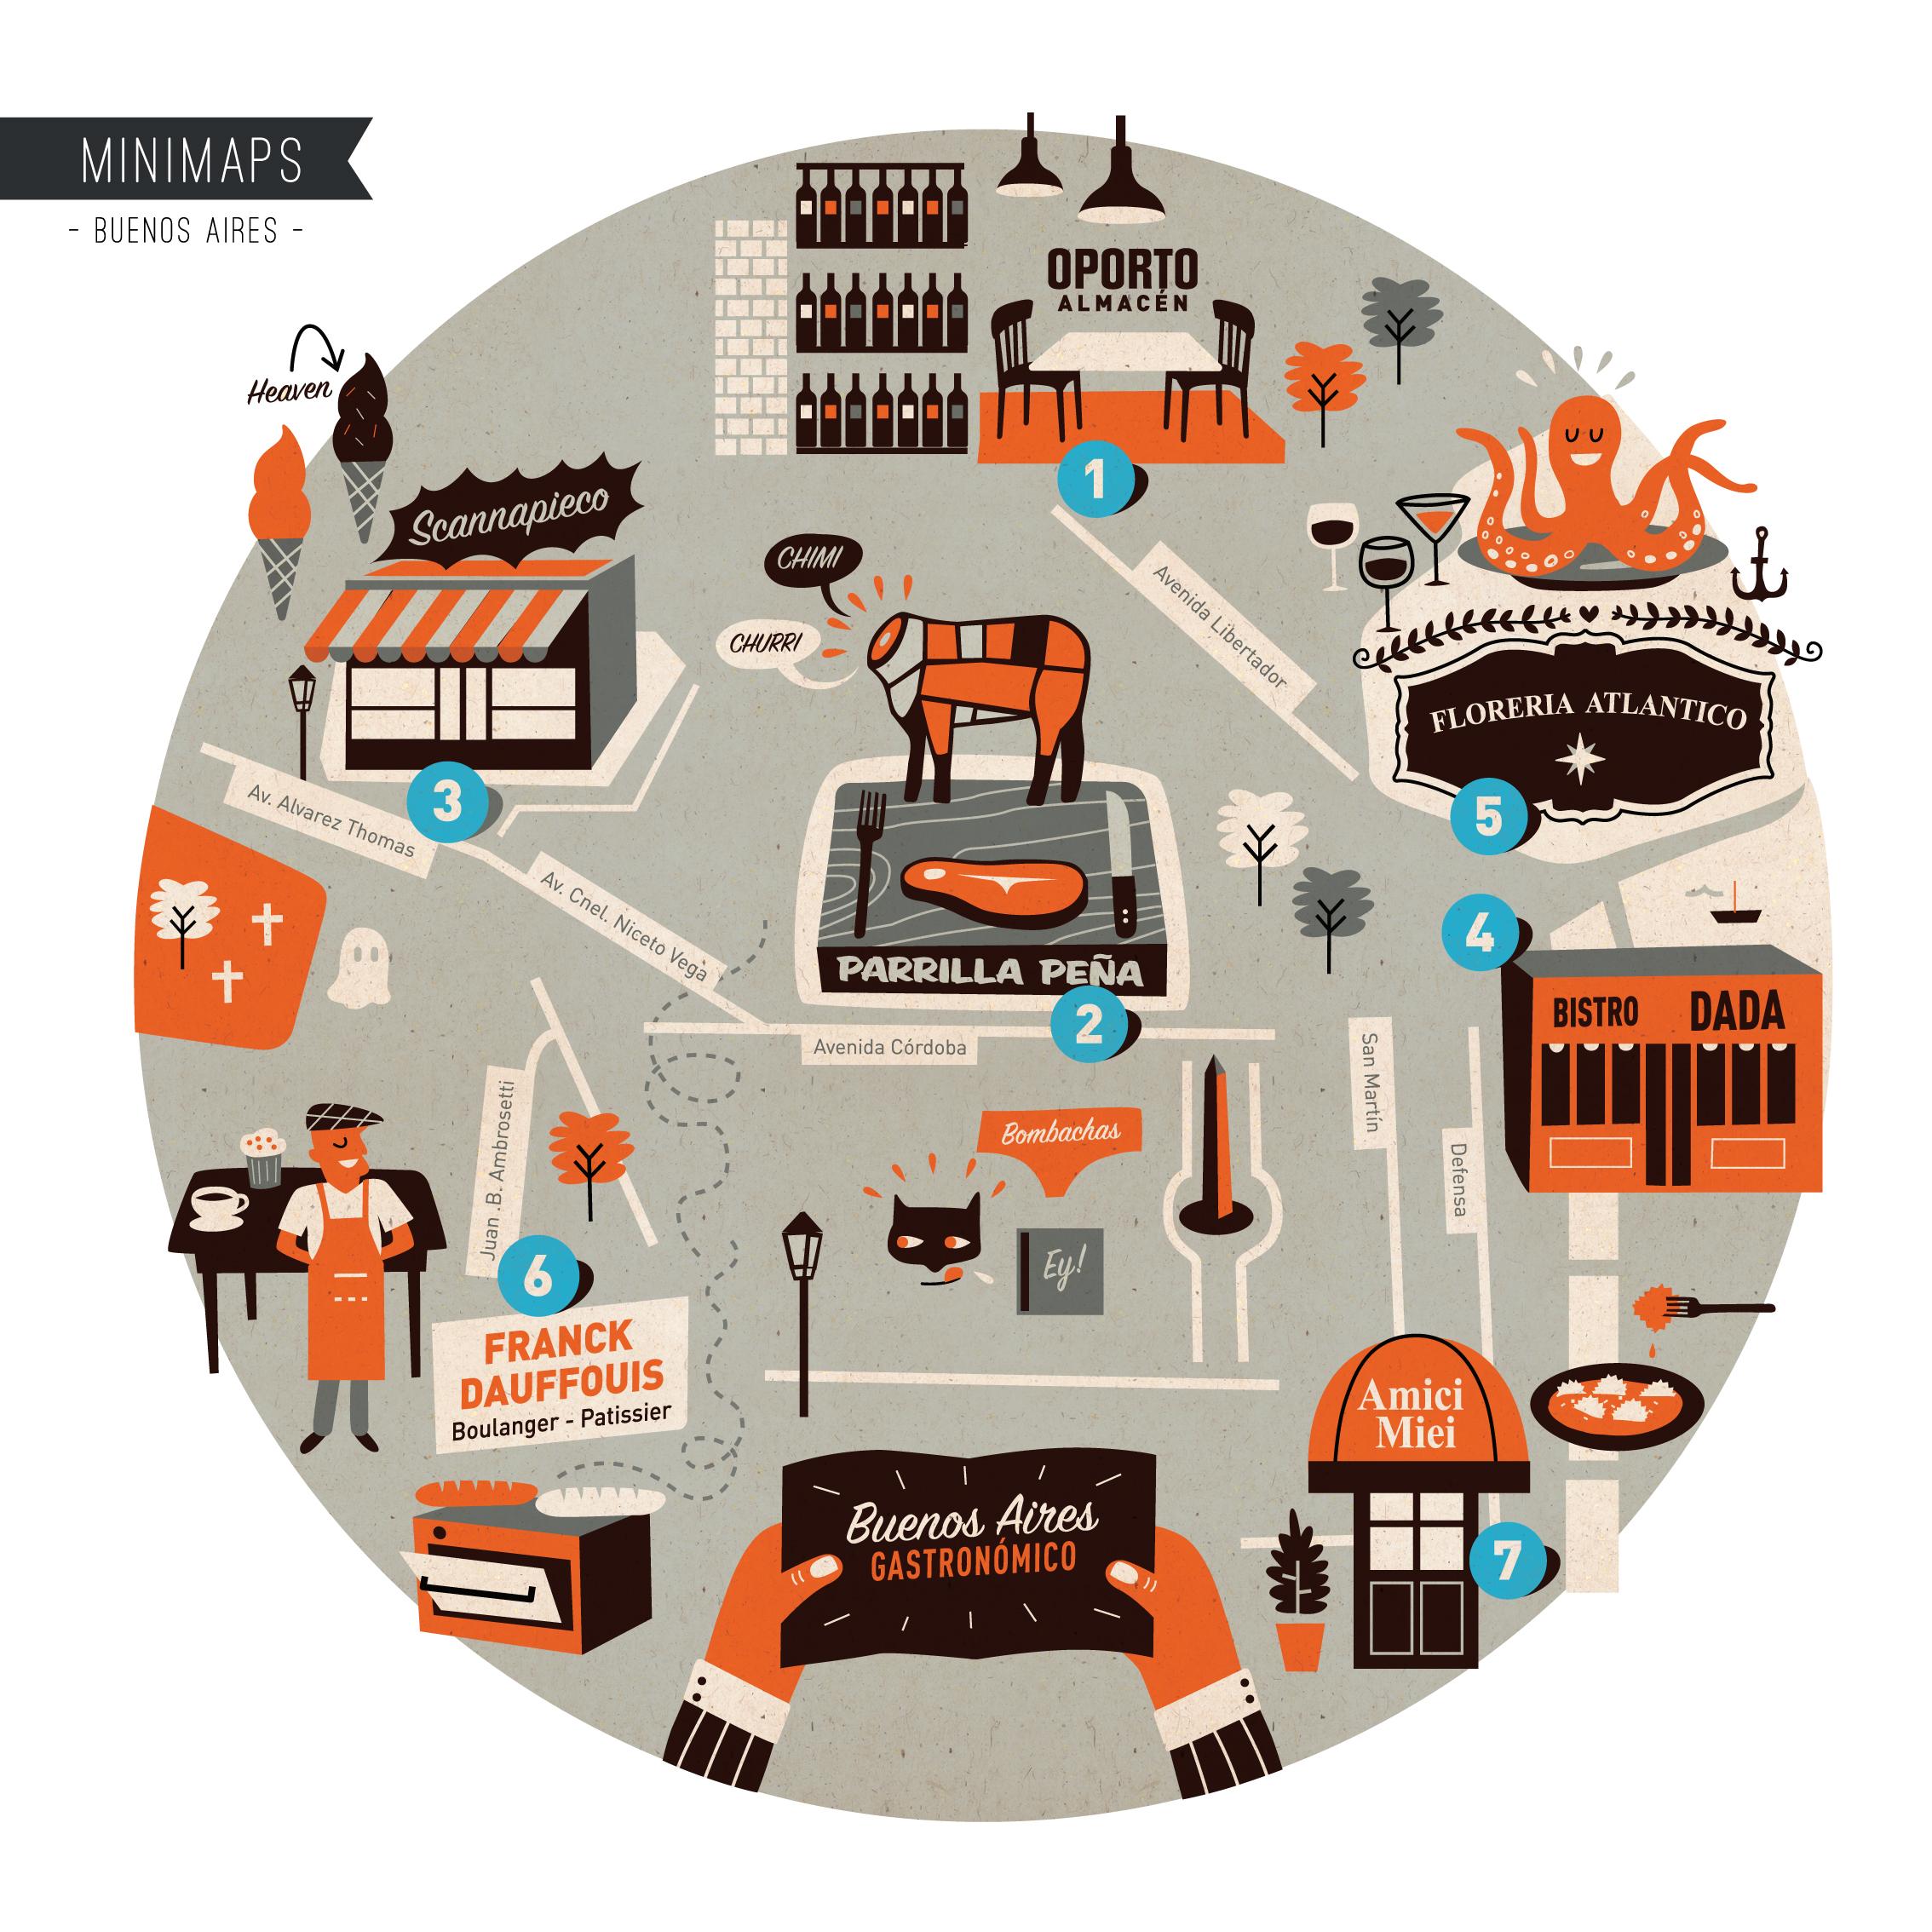 Buenos Aires Minimap - More: www.superminimaps.com